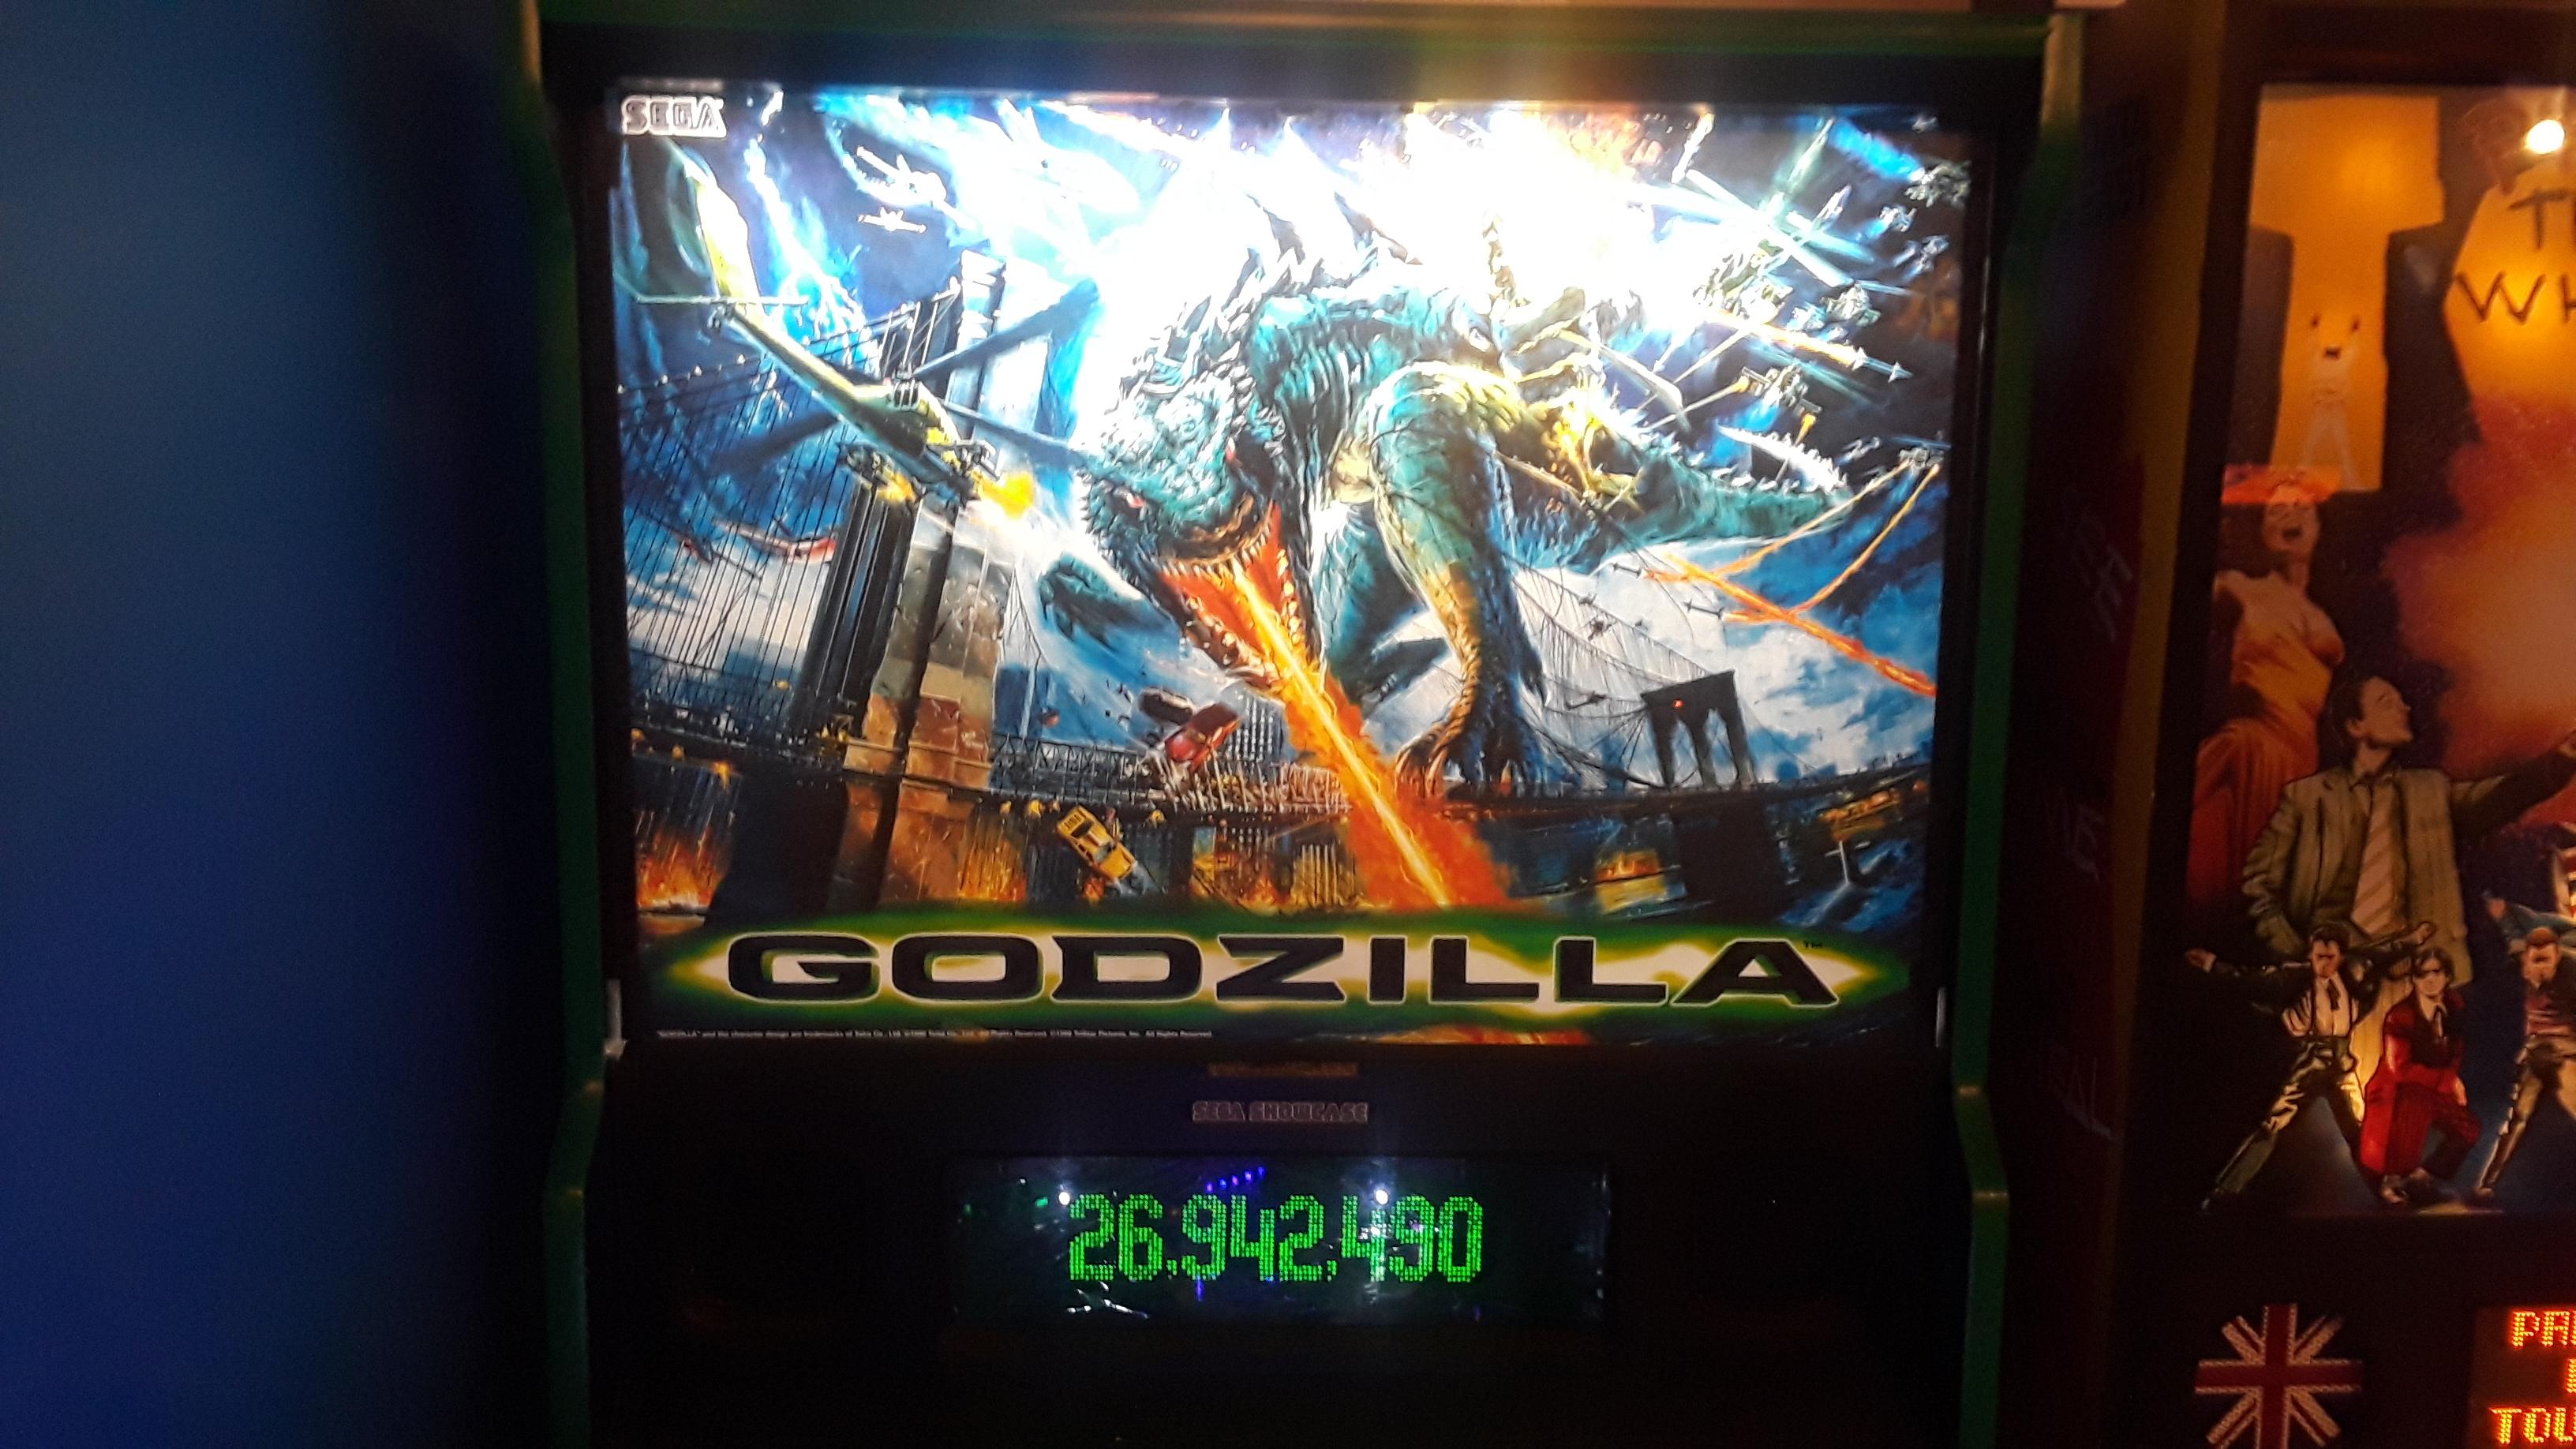 Godzilla 26,942,490 points